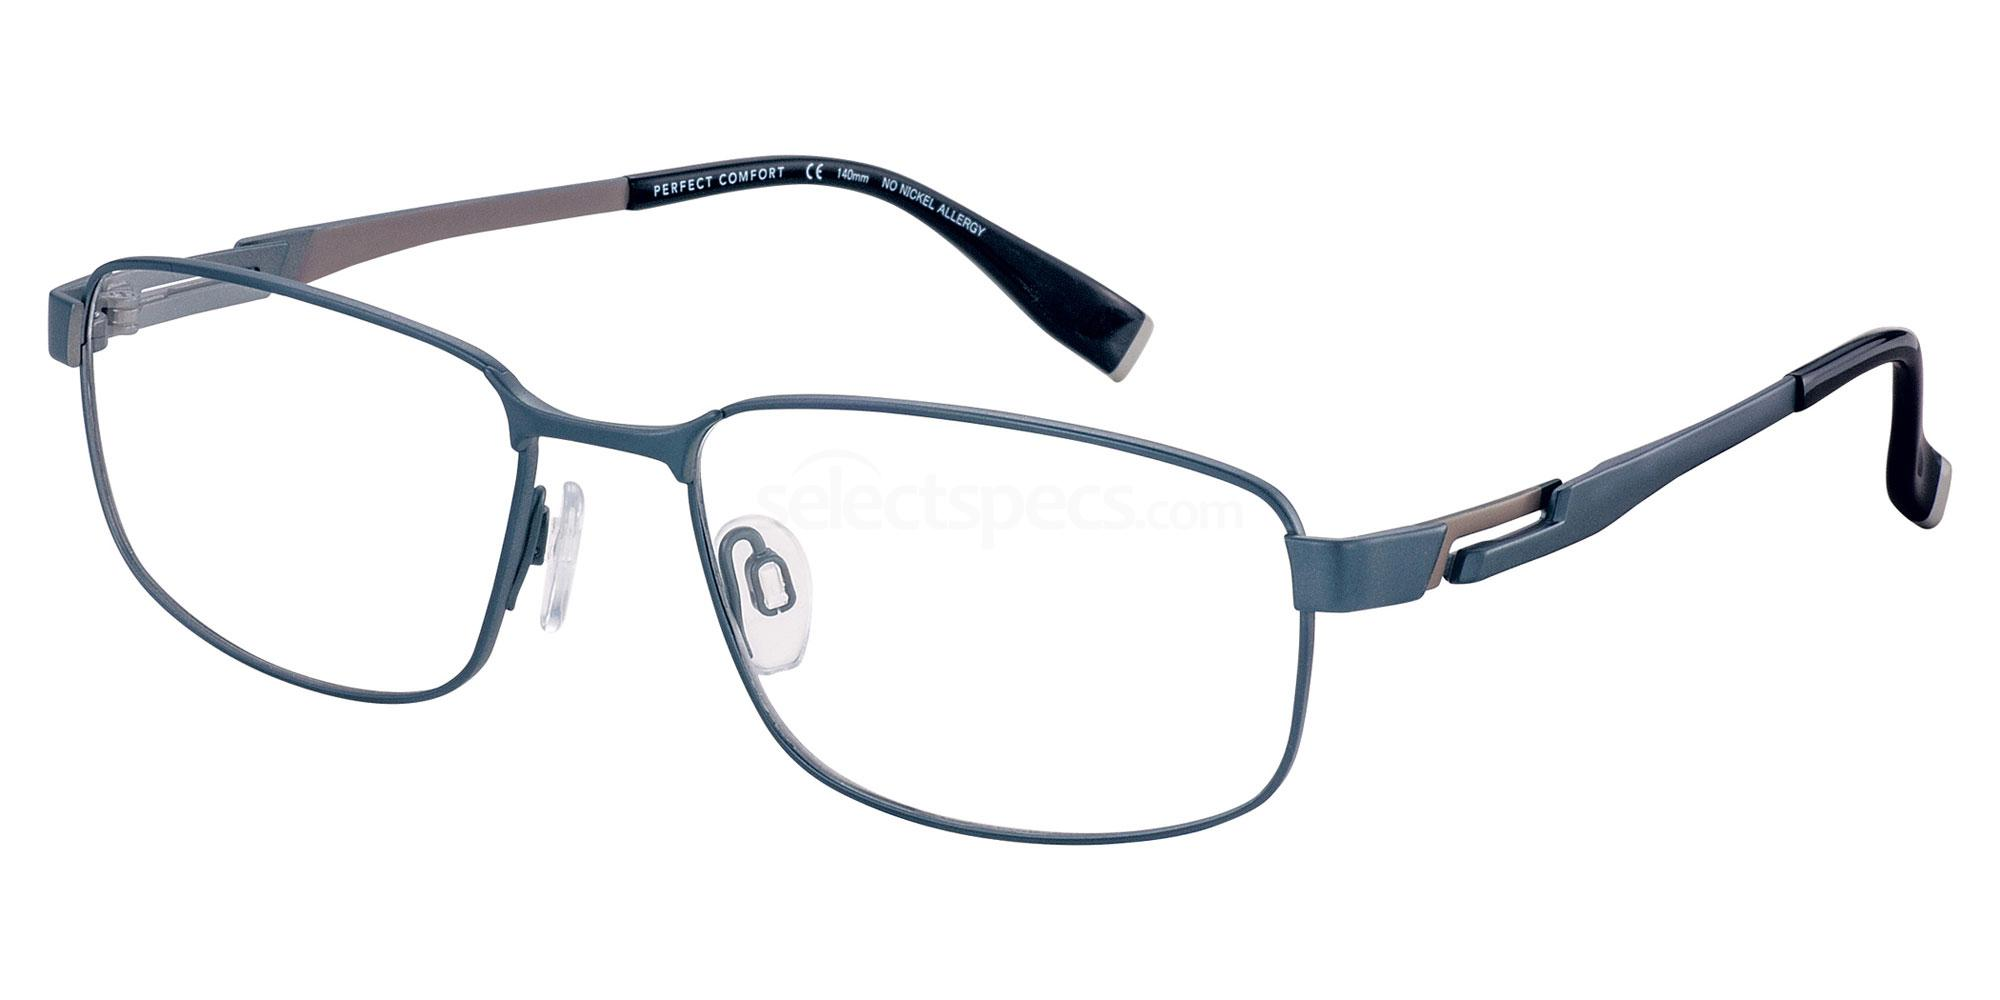 BL CH12312 Glasses, Charmant Perfect Comfort